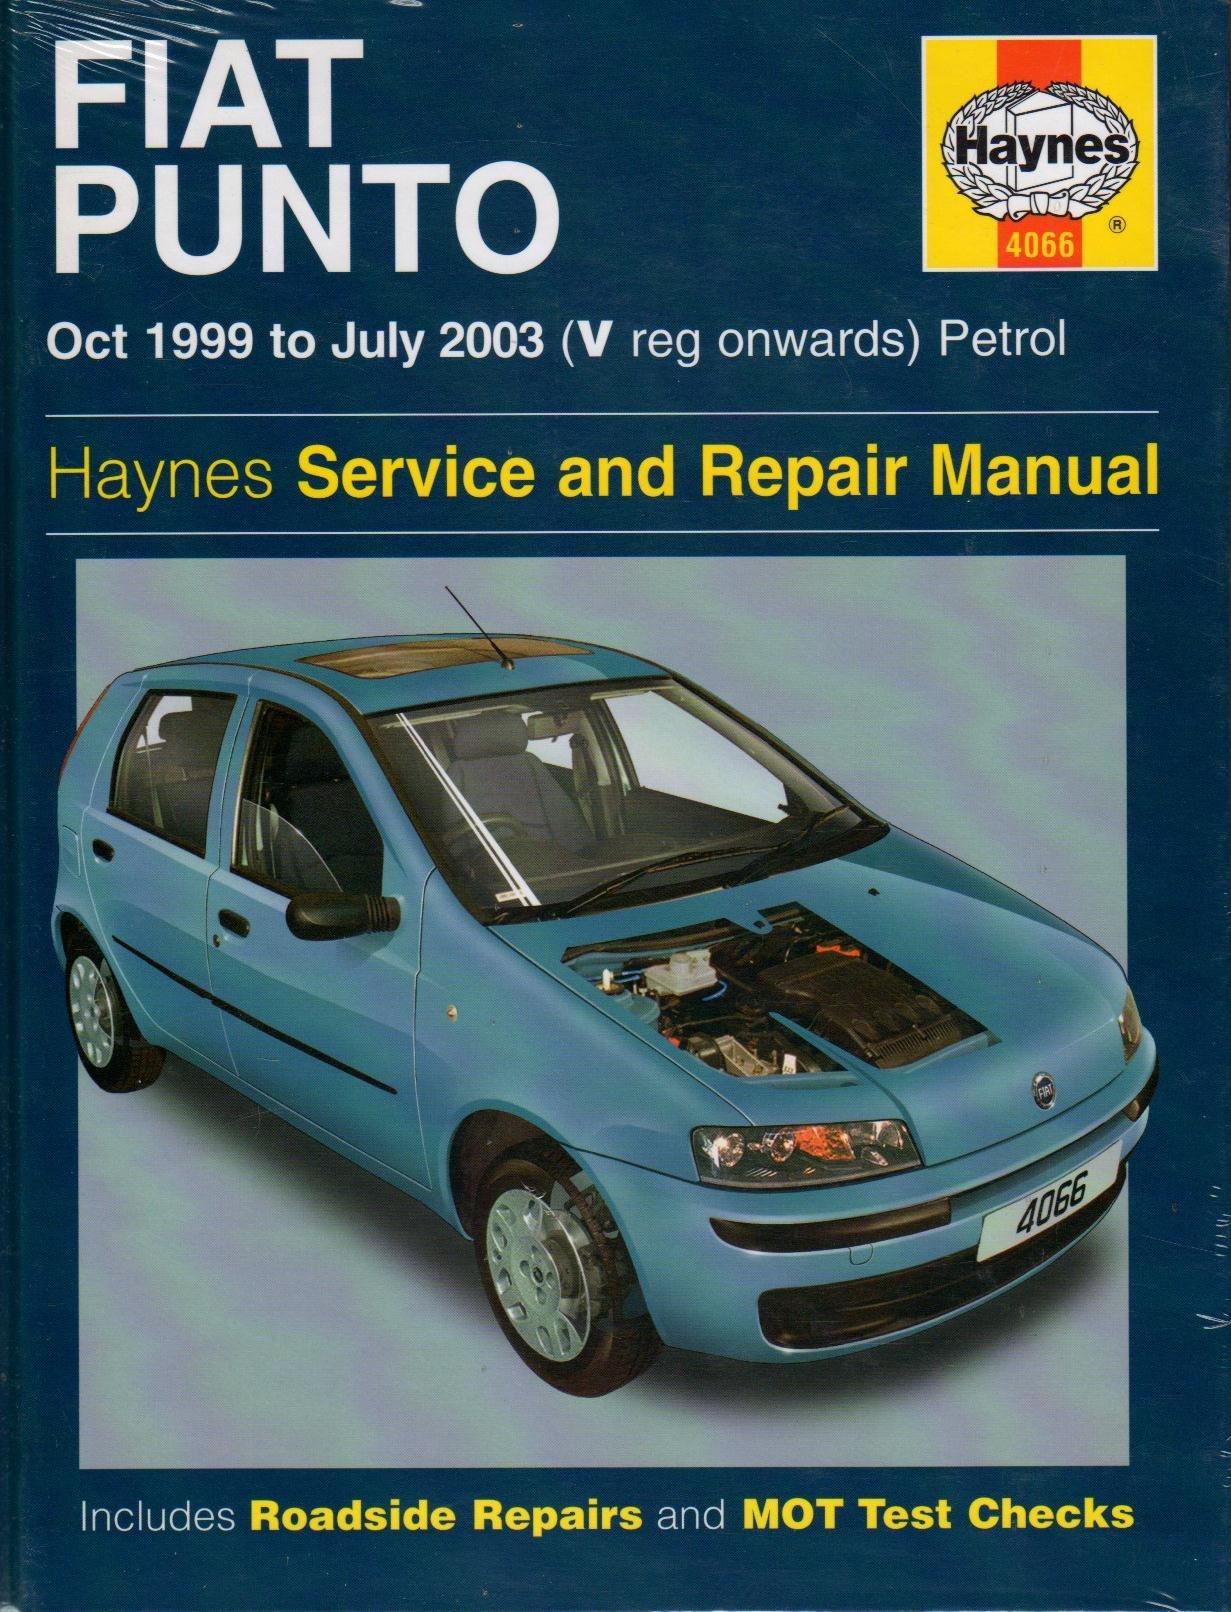 Fiat Punto Petrol Service And Repair Manual  Oct 1999 To July 2003  Haynes Service And Repair Manuals